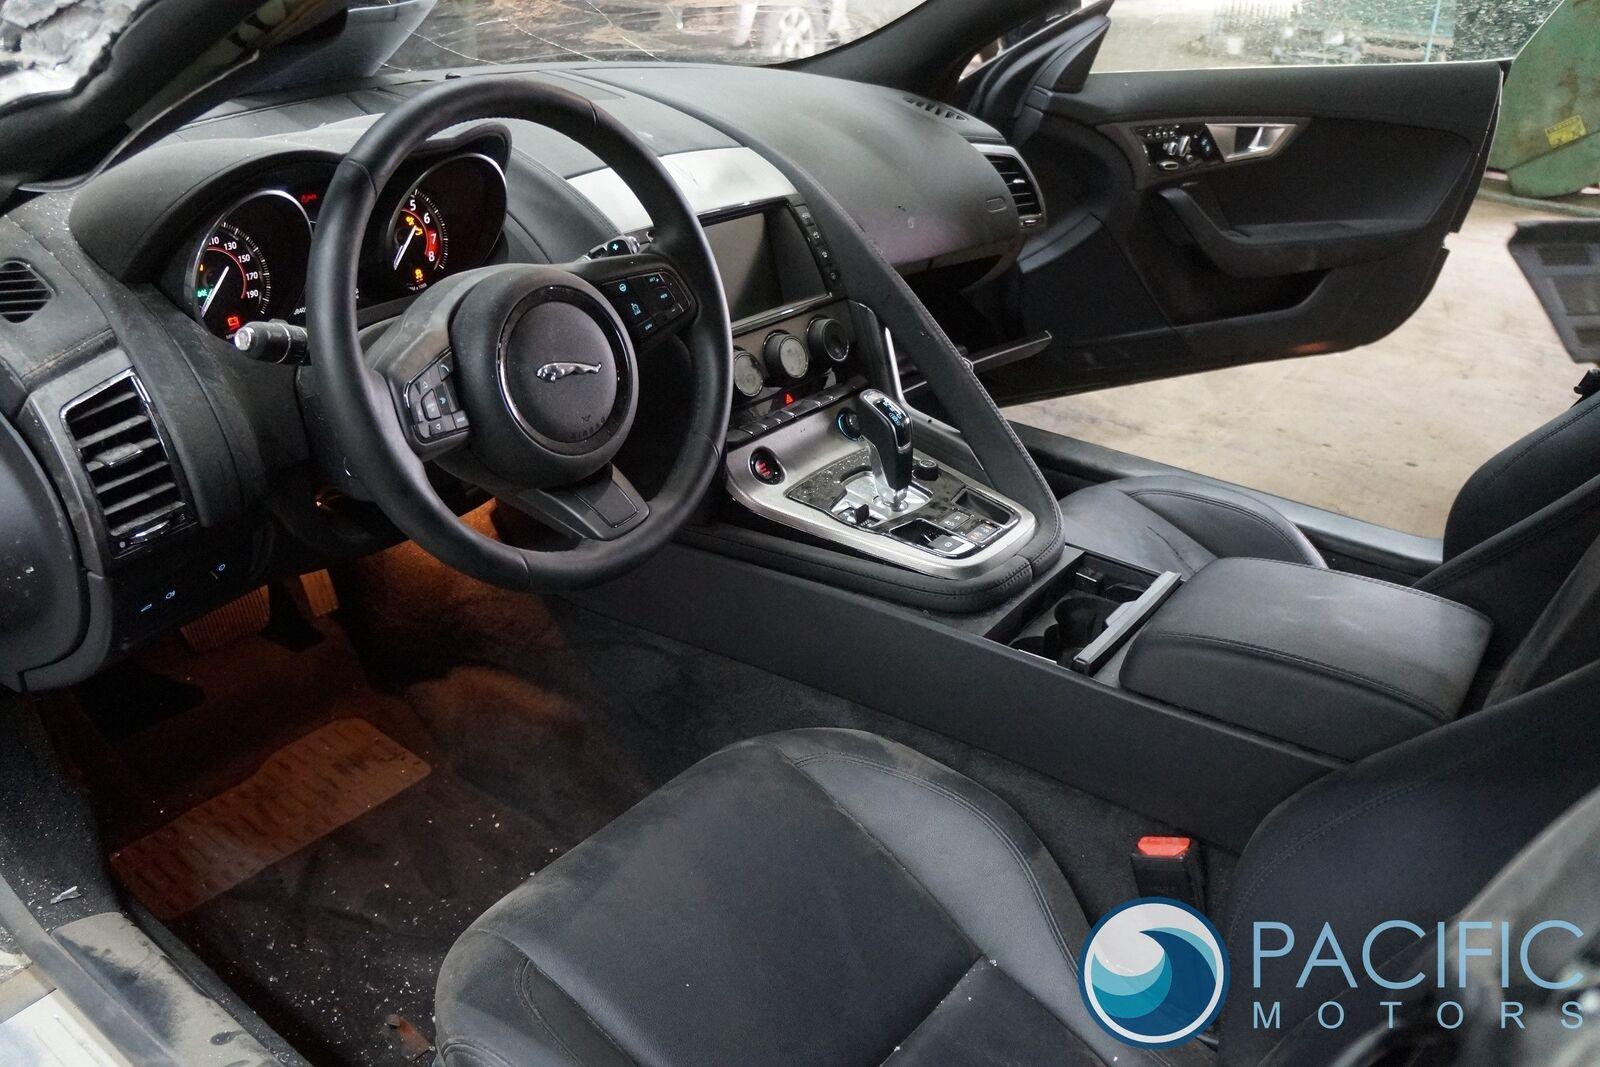 Engine Bay Compartment Fuse Box Block C2d23644 Jaguar F Type 2014 17 Types Of Car Boxes